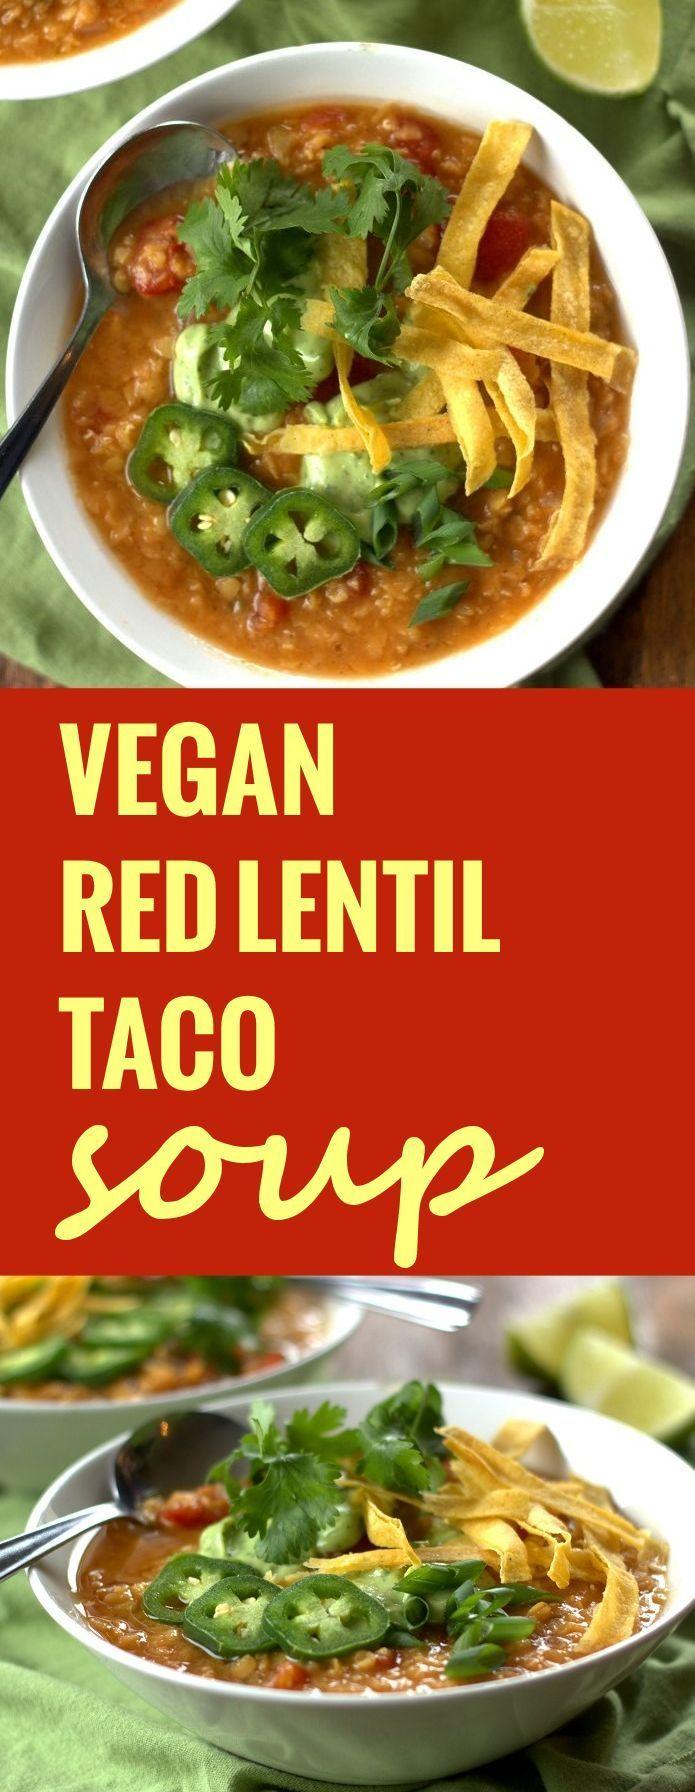 ideas about Vegan Taco Salads on Pinterest   Taco salad shells, Taco ...